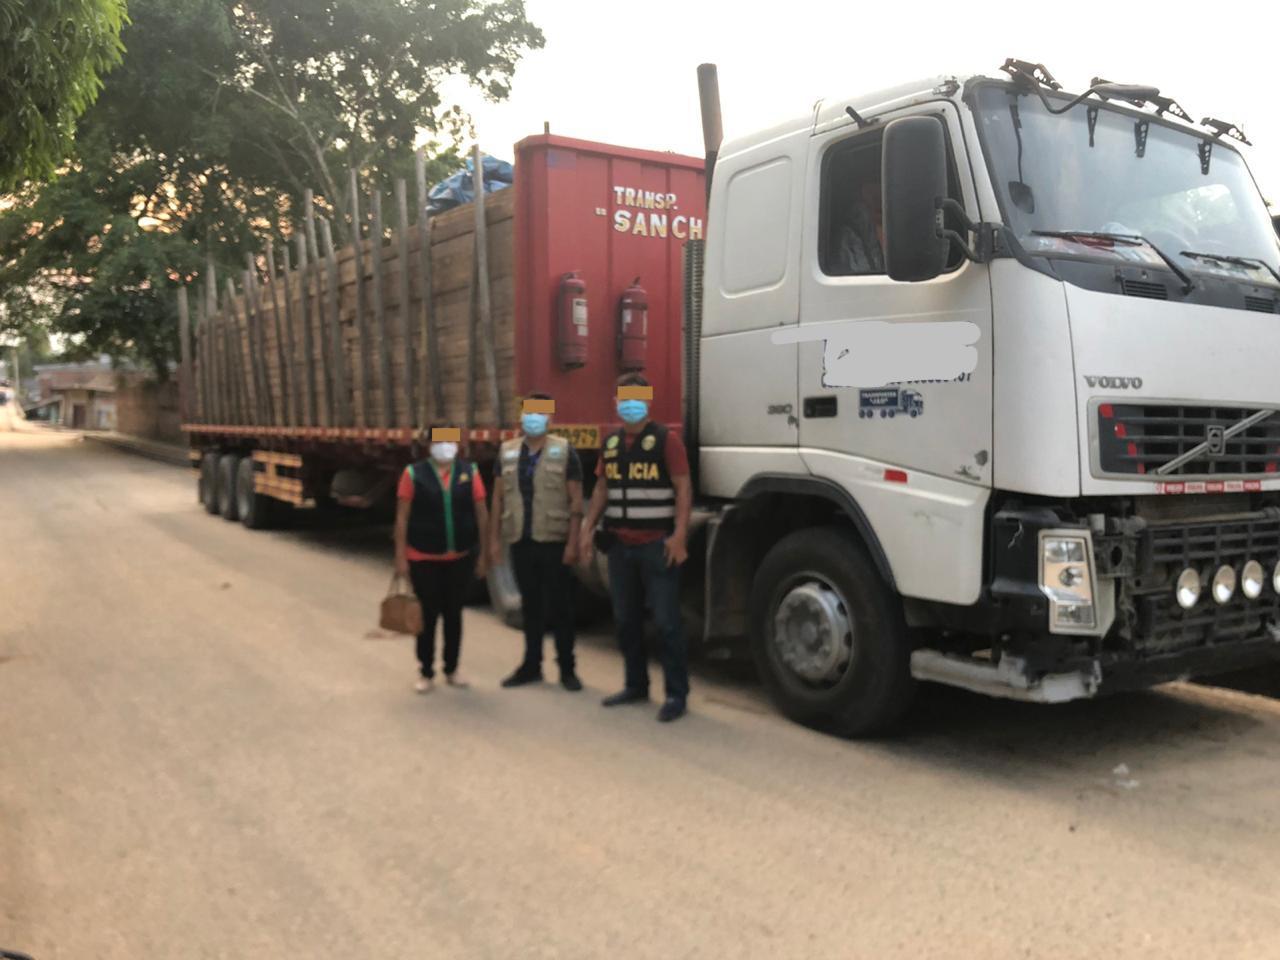 30m3 of Cumala and Lupuna lumber seized in Puerto La Boca